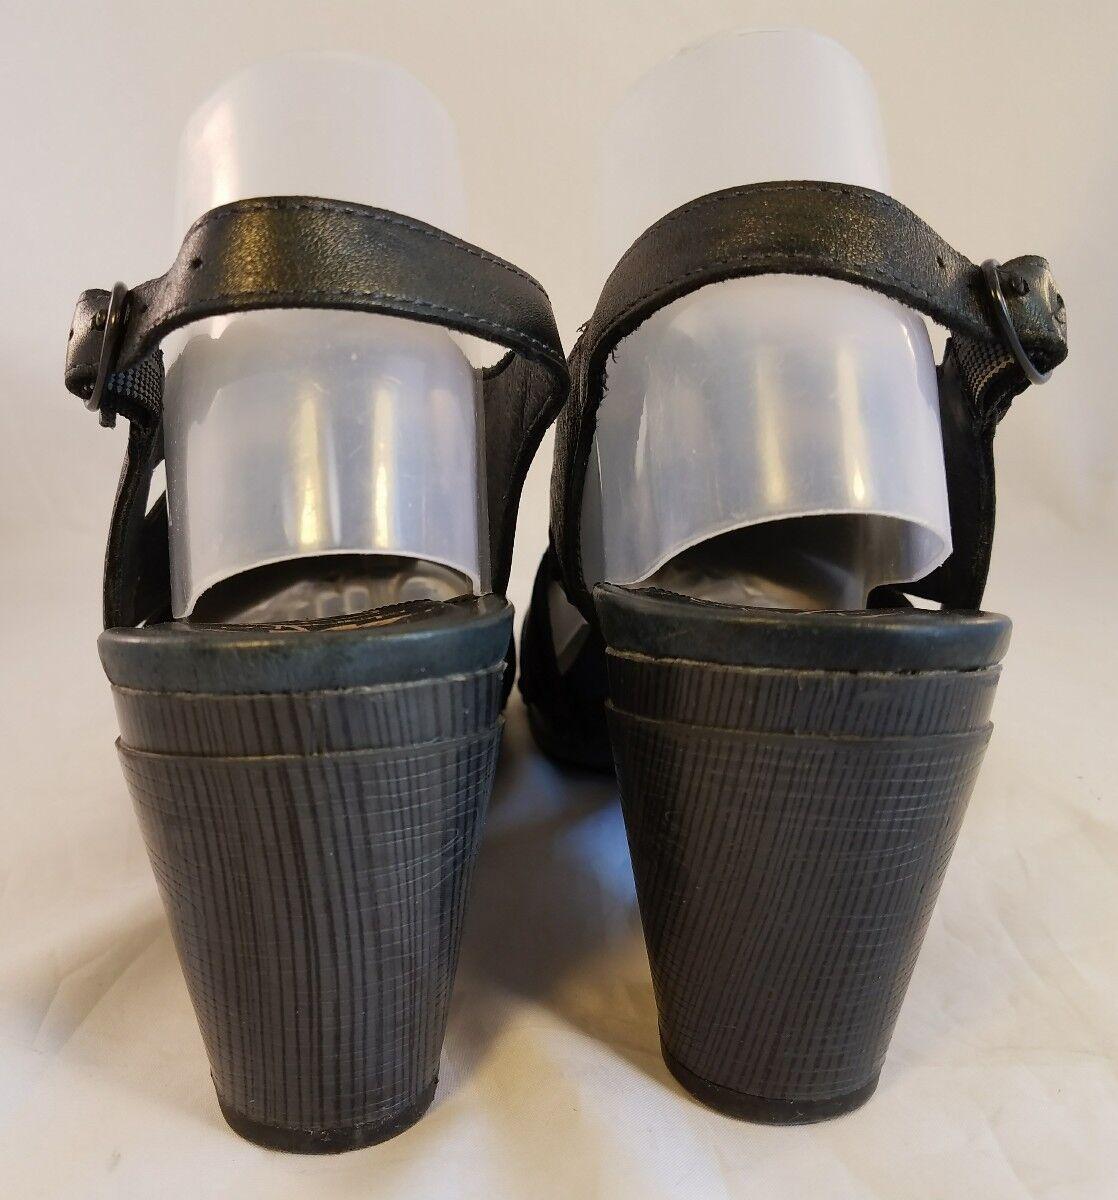 Dansko woman studs schuhe 41/10-10.5 Sandales metallic charcoal schwarz Leder 41/10-10.5 schuhe EUC 86cddb